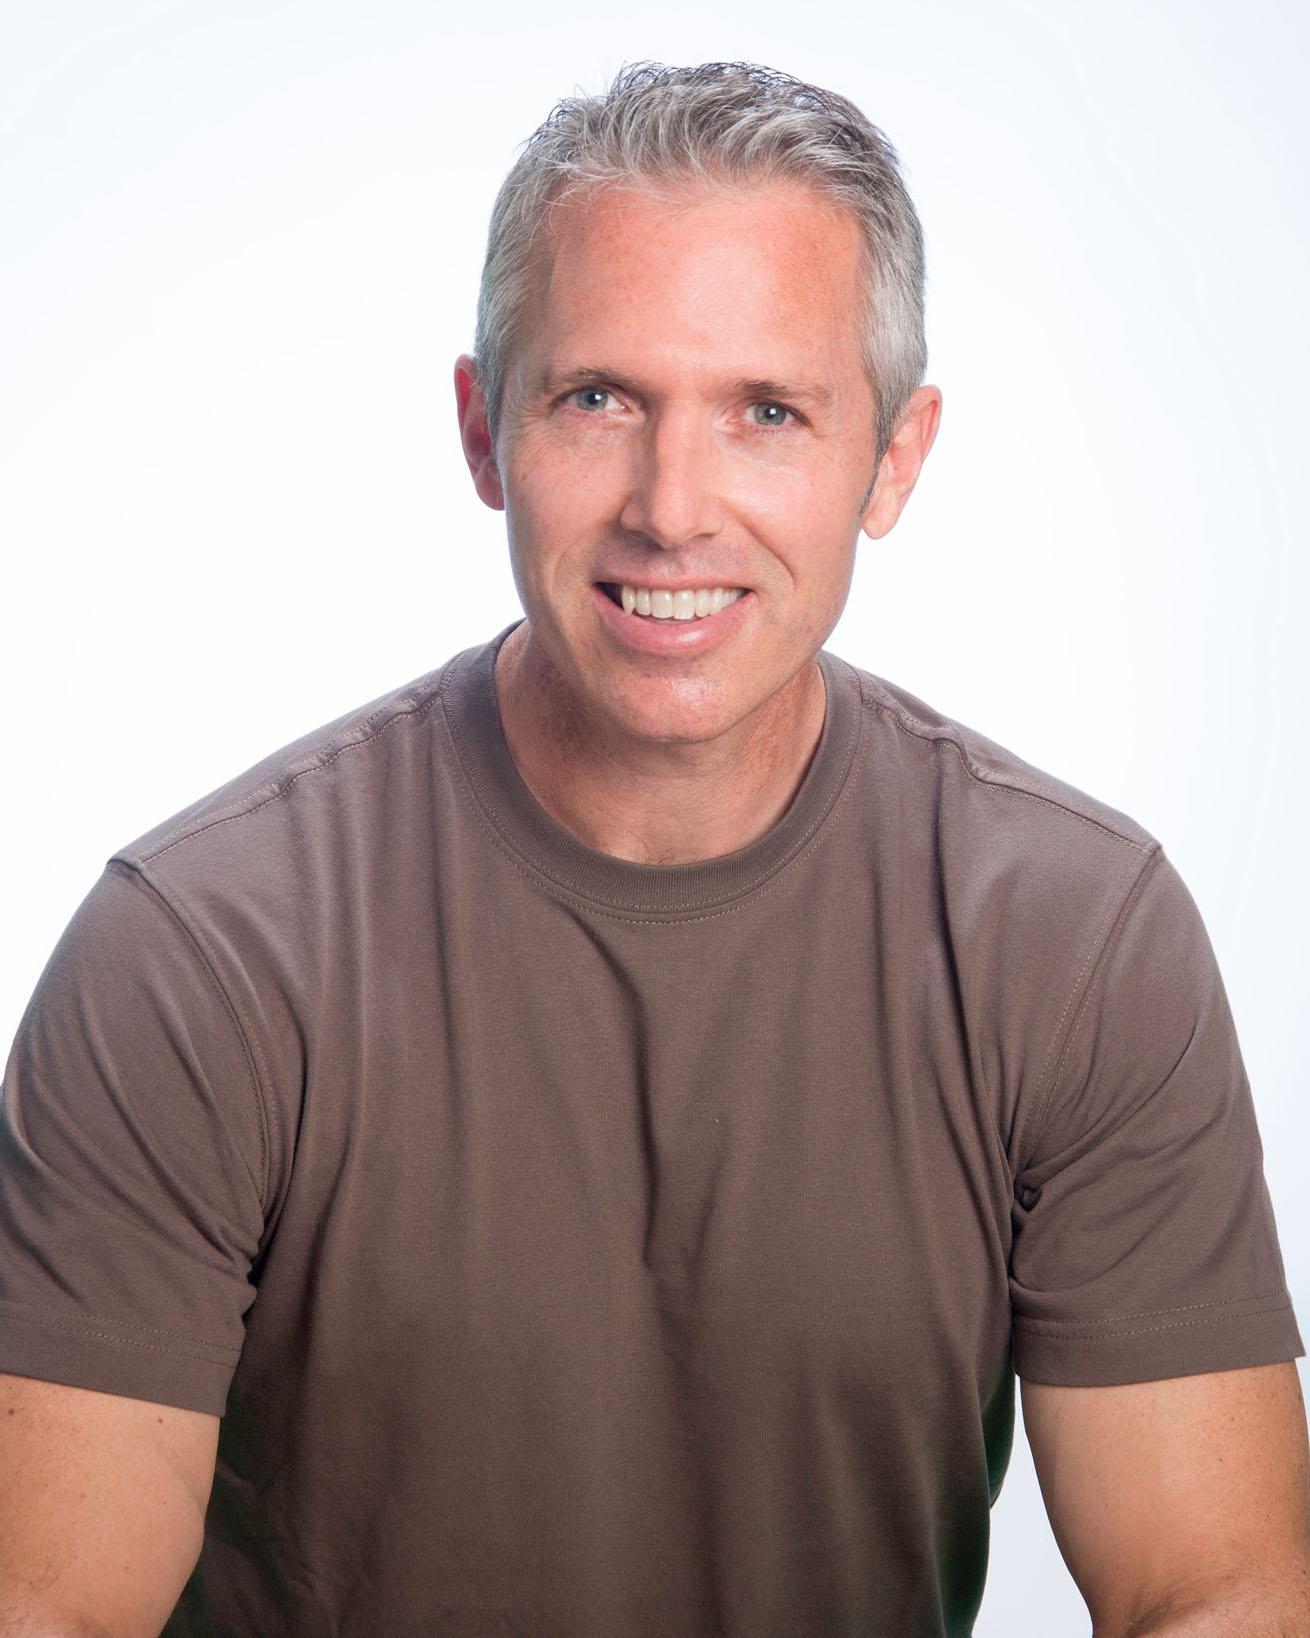 Tim Salmonson